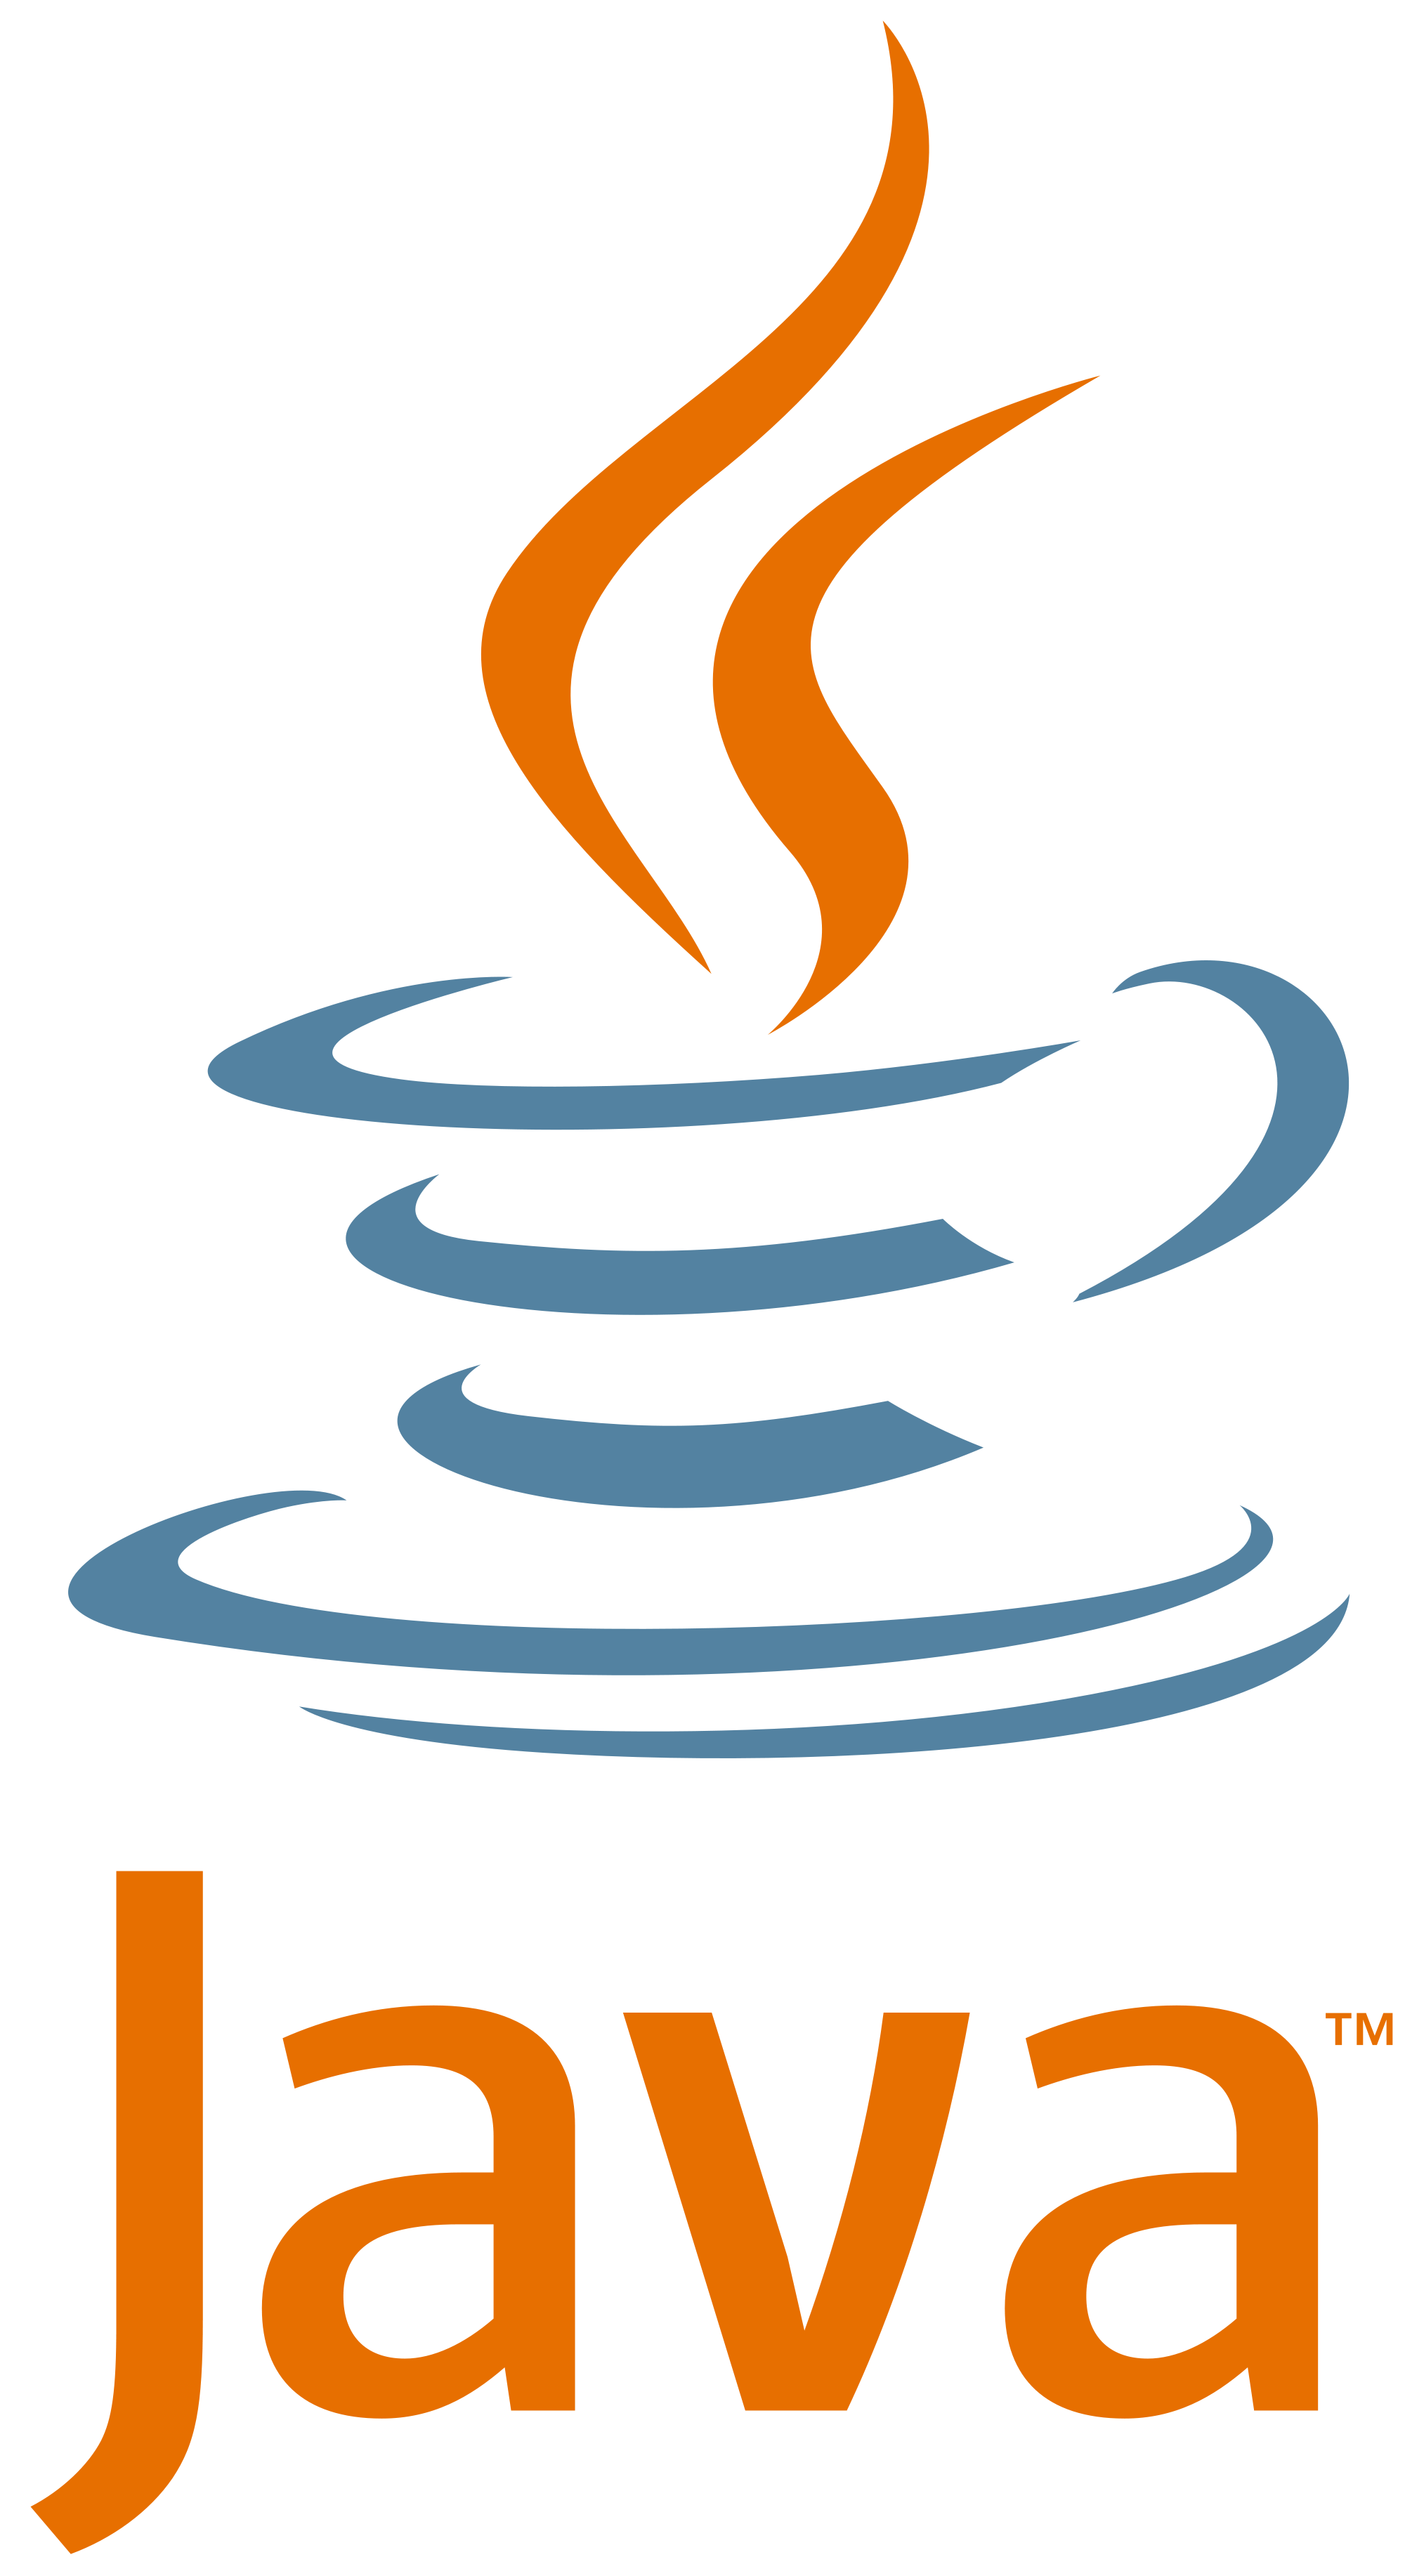 Java PNG Transparent Images #2386614